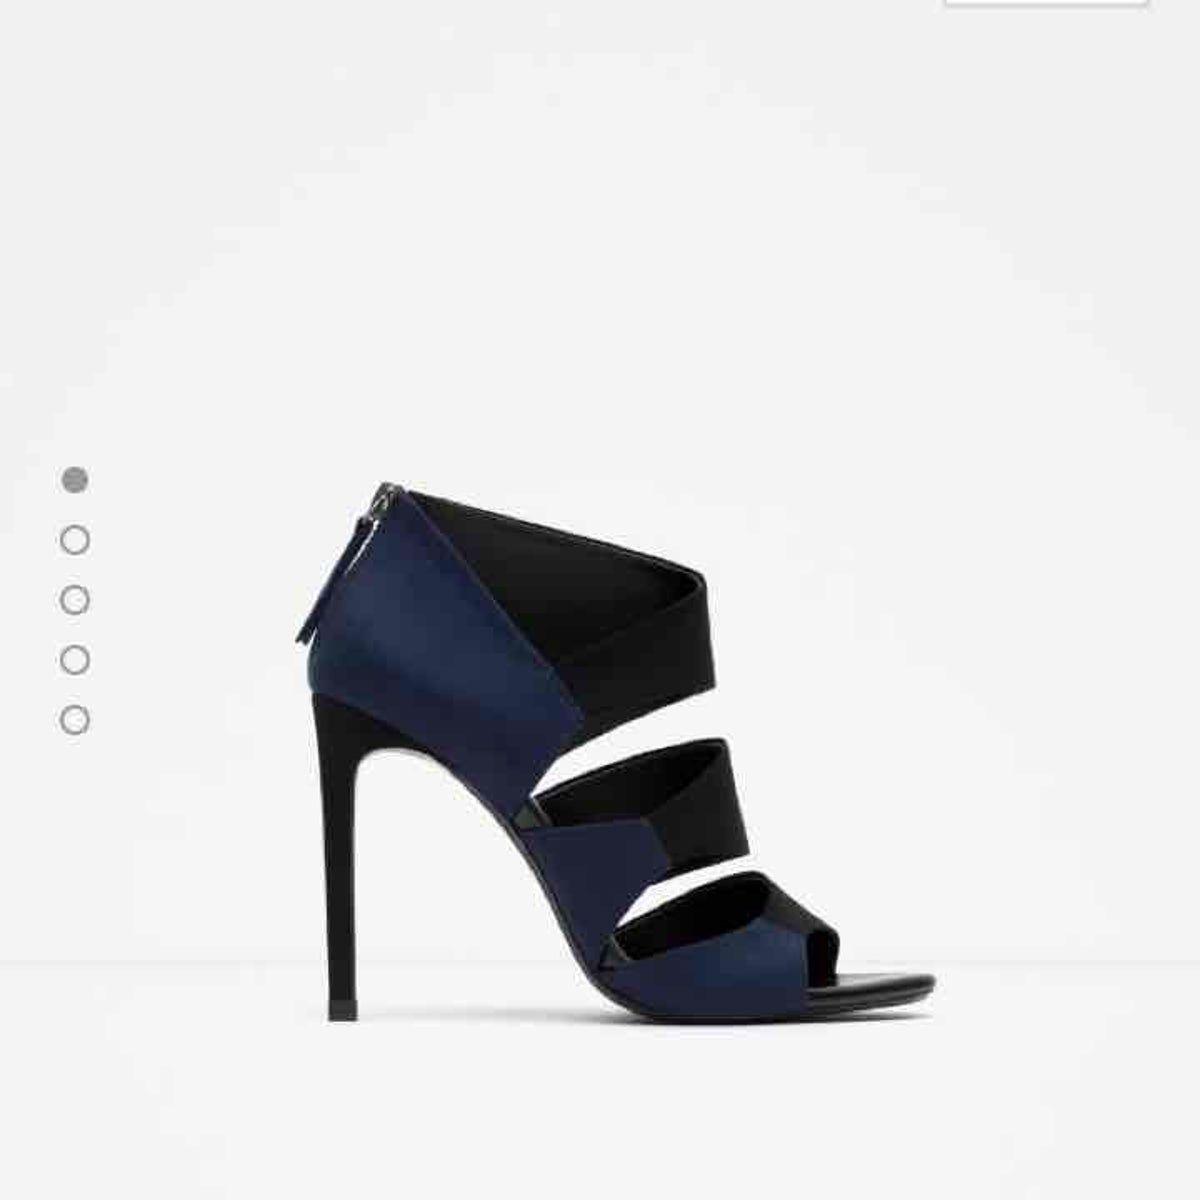 Pin By Sue Ann Powers On Casual Dressy Heels And Purses In 2020 Black Sandals Heels Heels Shoes Women Heels